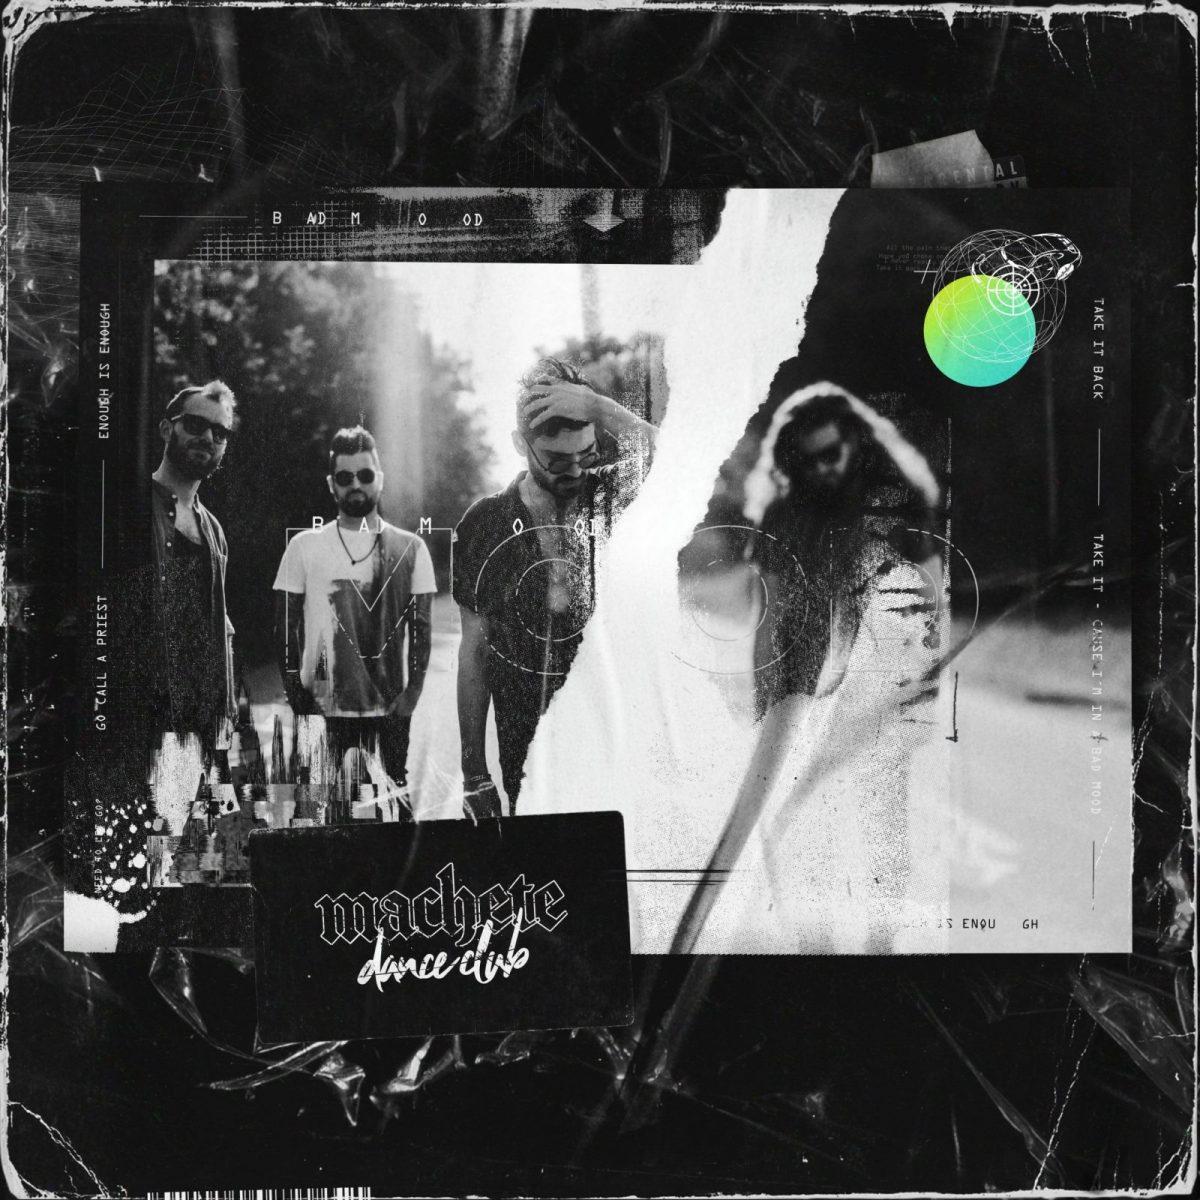 machete-dance-club-bad-mood-video-premiere-single-review